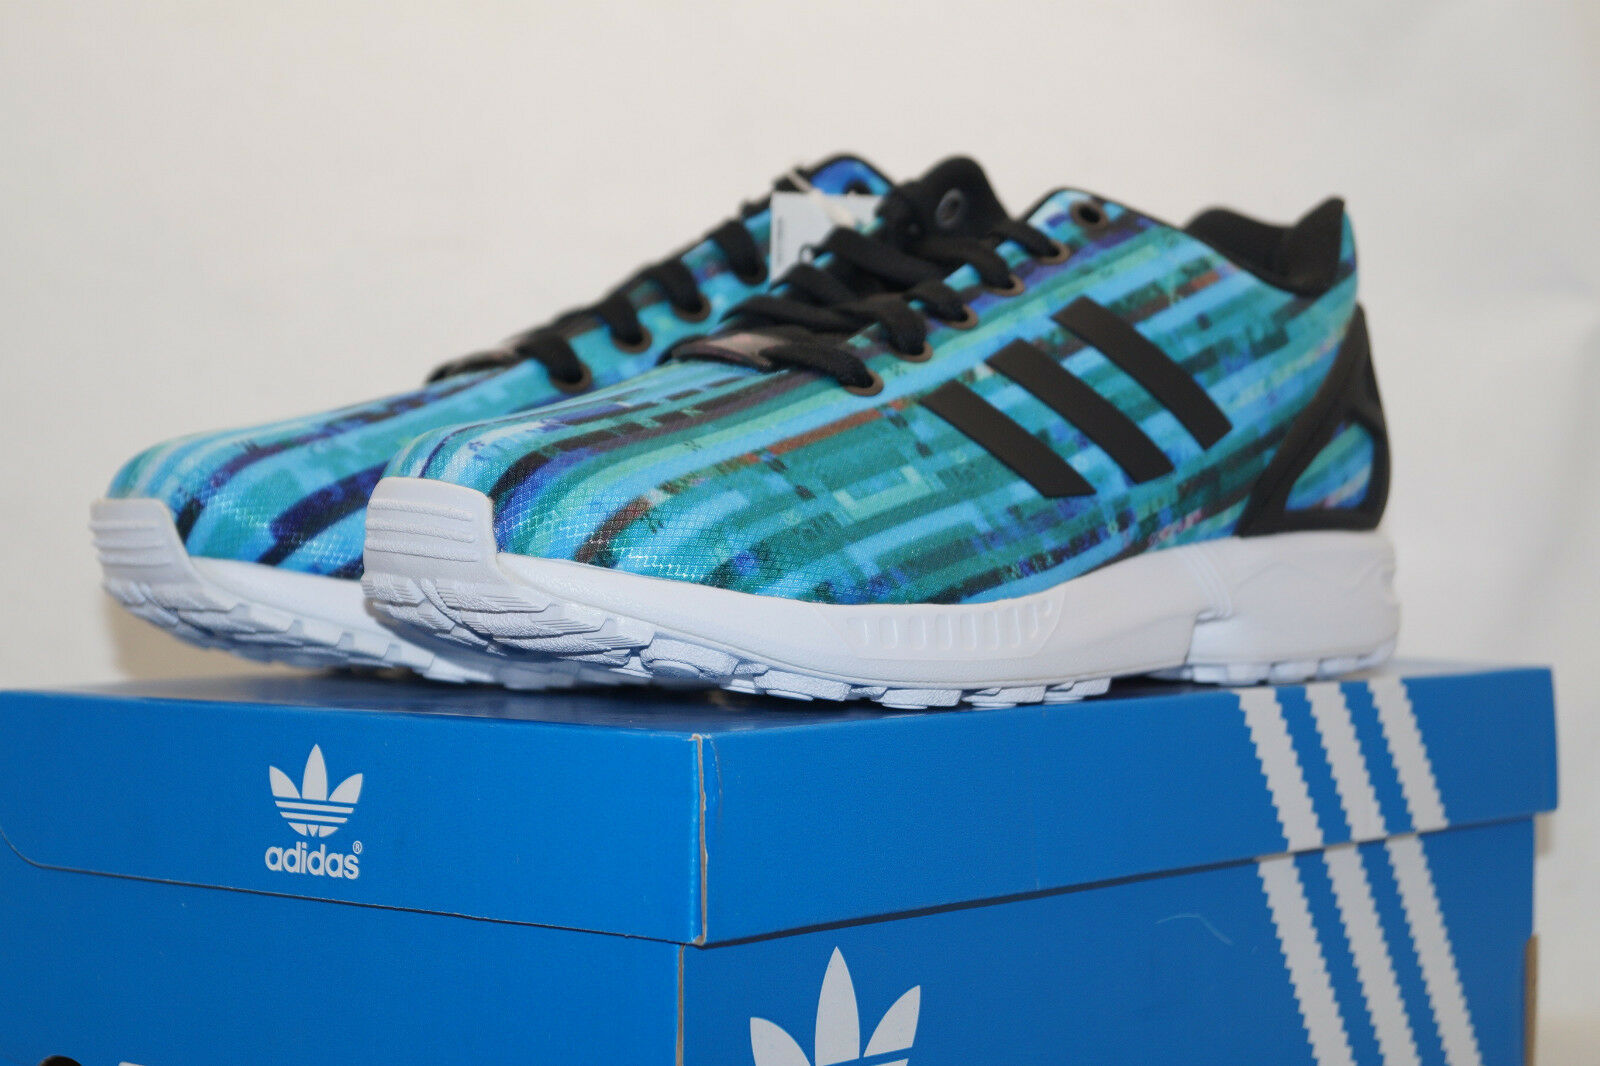 Adidas ZX Flux torsion UE 41.3 Running zapatos turquesa s76505 zapatillas